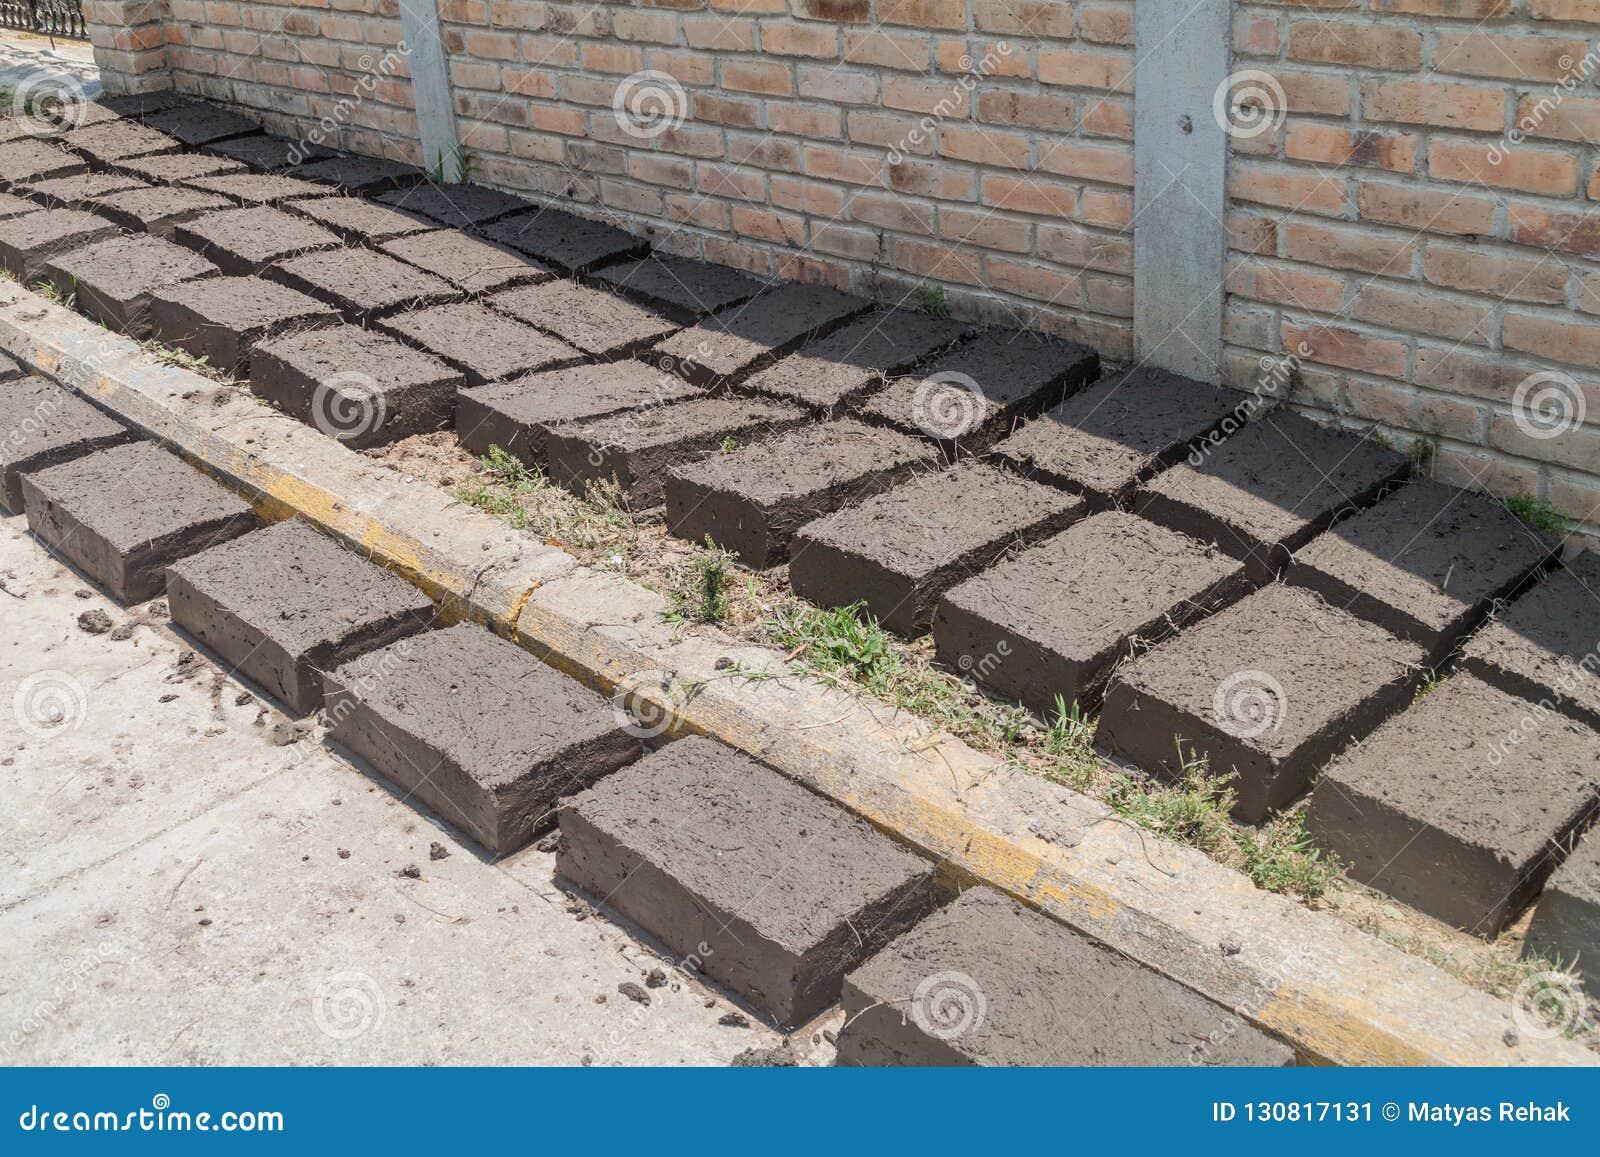 Adobe bricks dry in La Campa village, Hondur